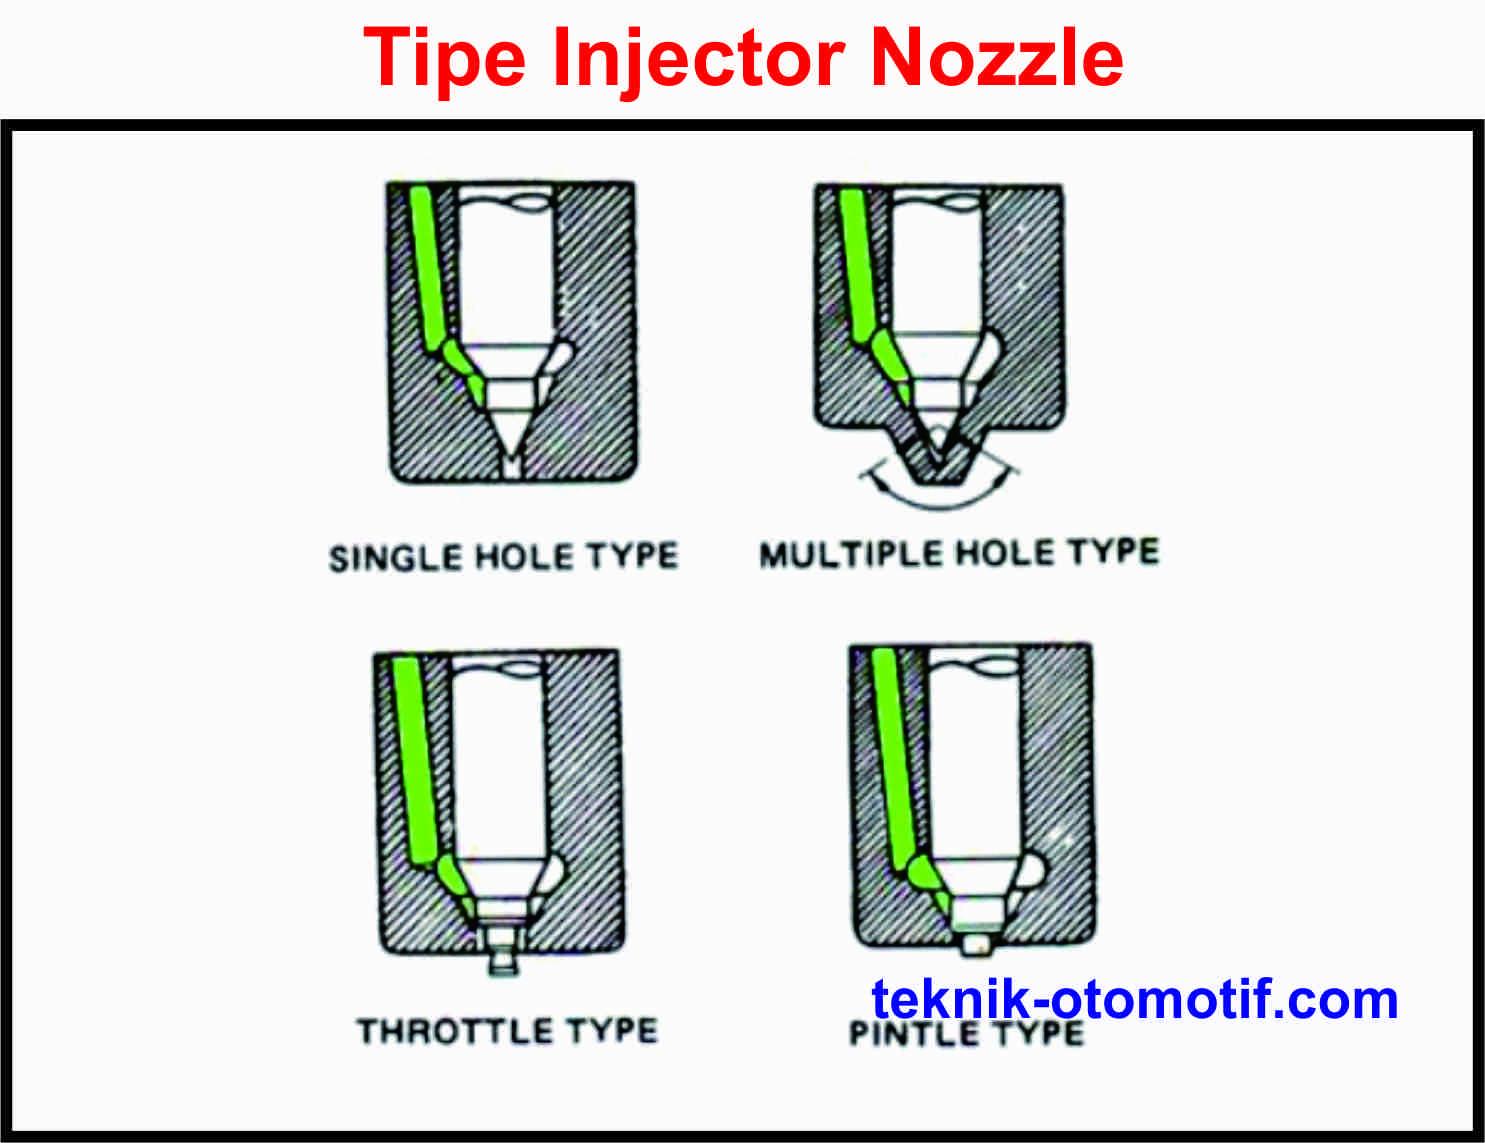 Cara Kerja Injector Nozzle Motor Diesel | teknik-otomotif com